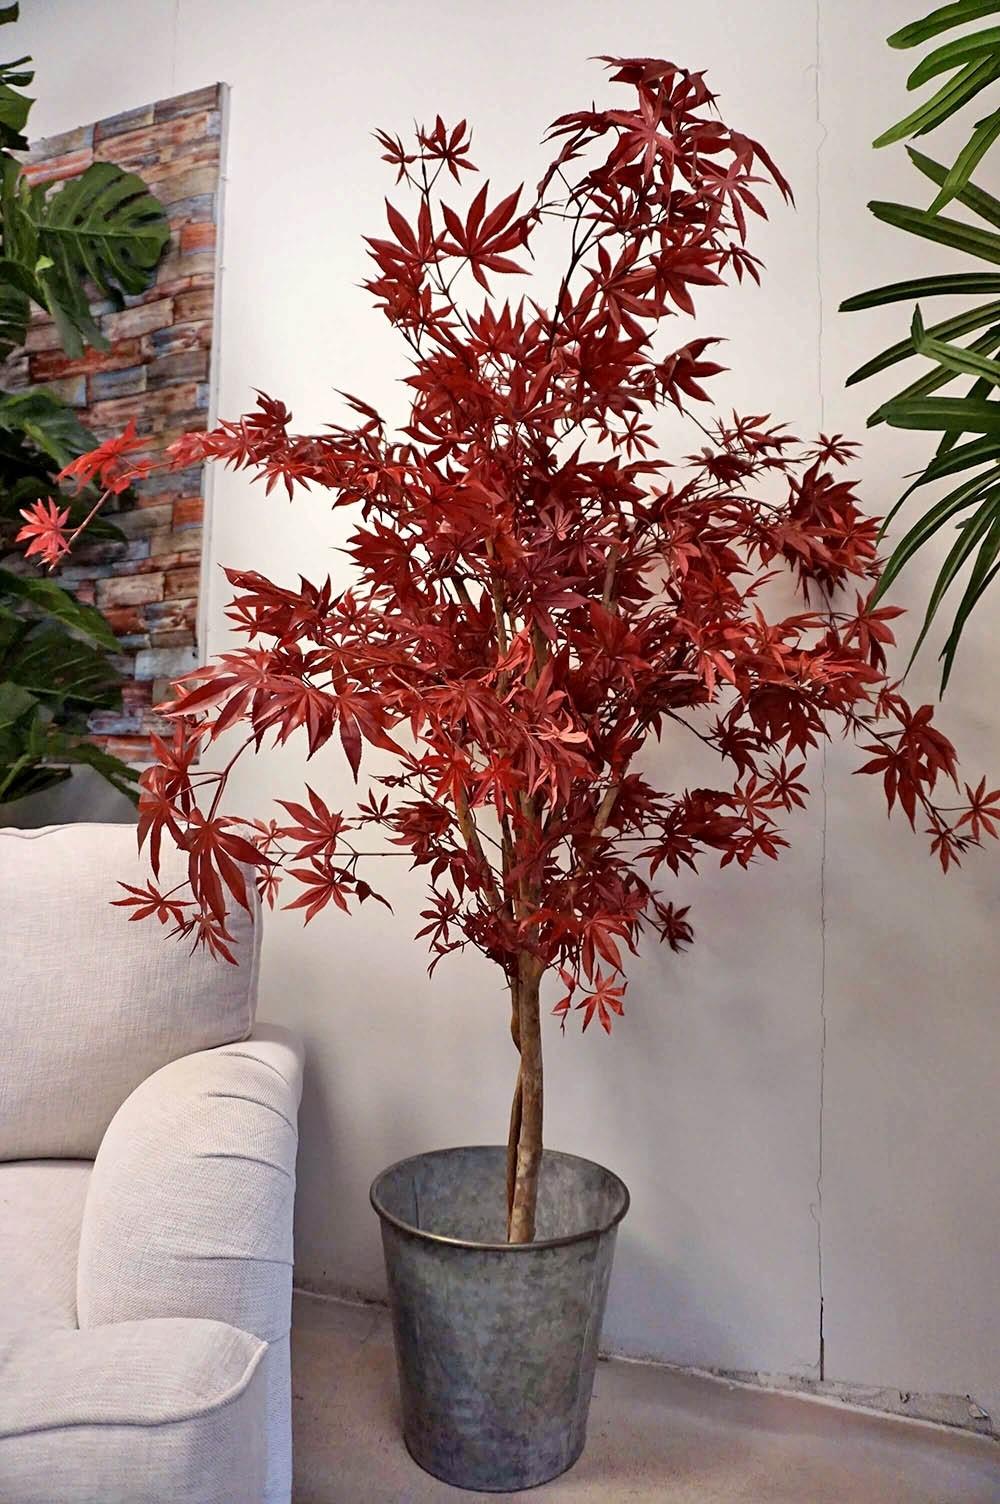 Japansk lönn, konstgjort träd